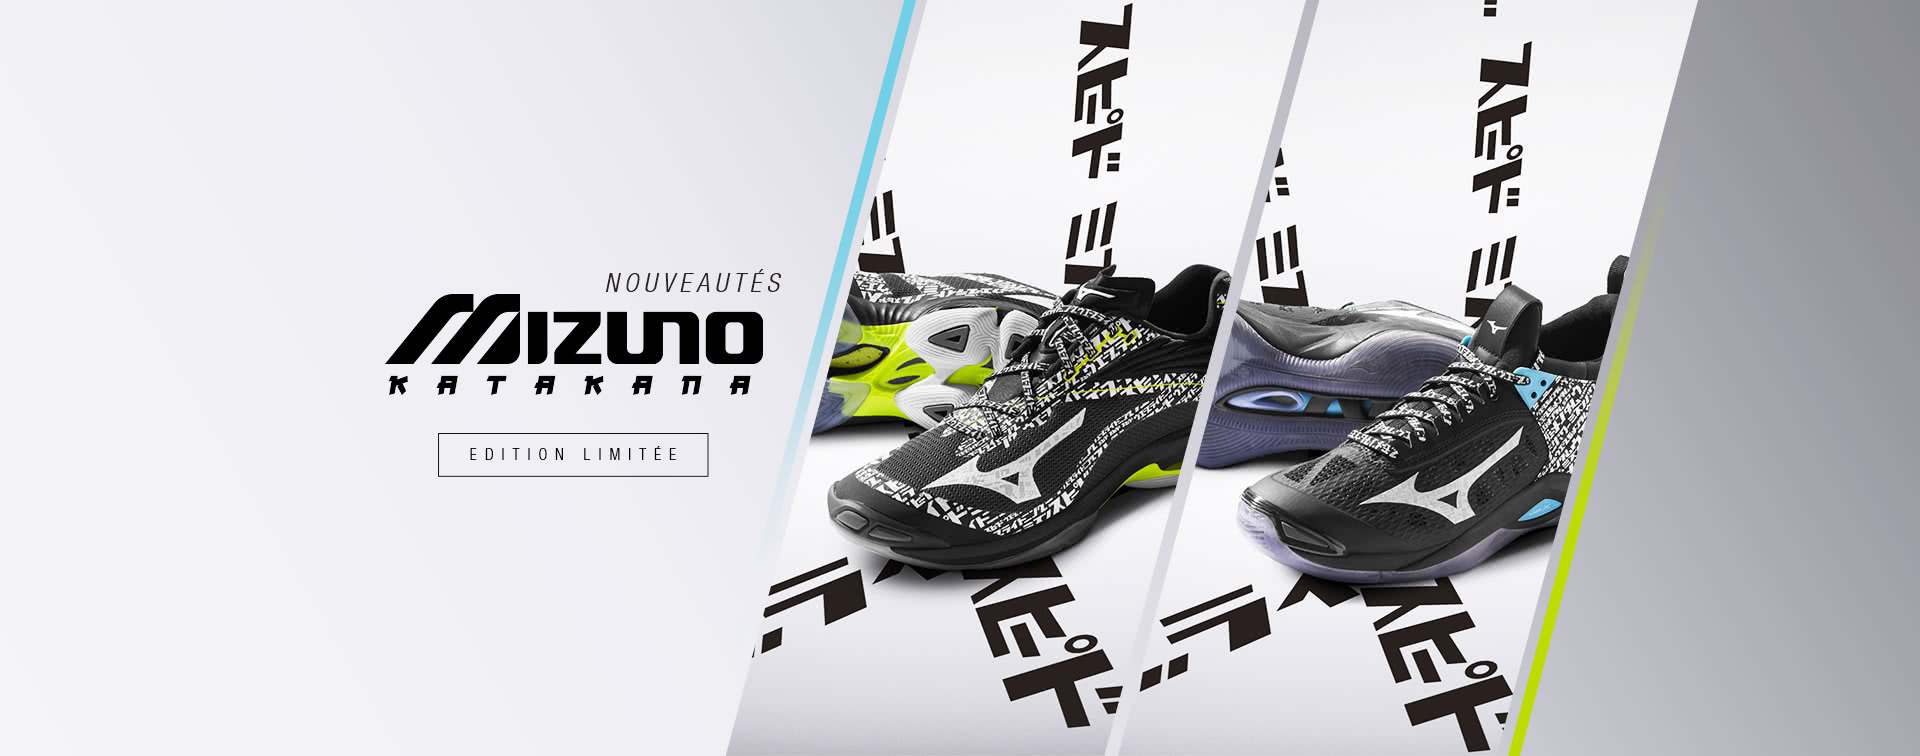 Nouvelles chaussures Mizuno Katakana